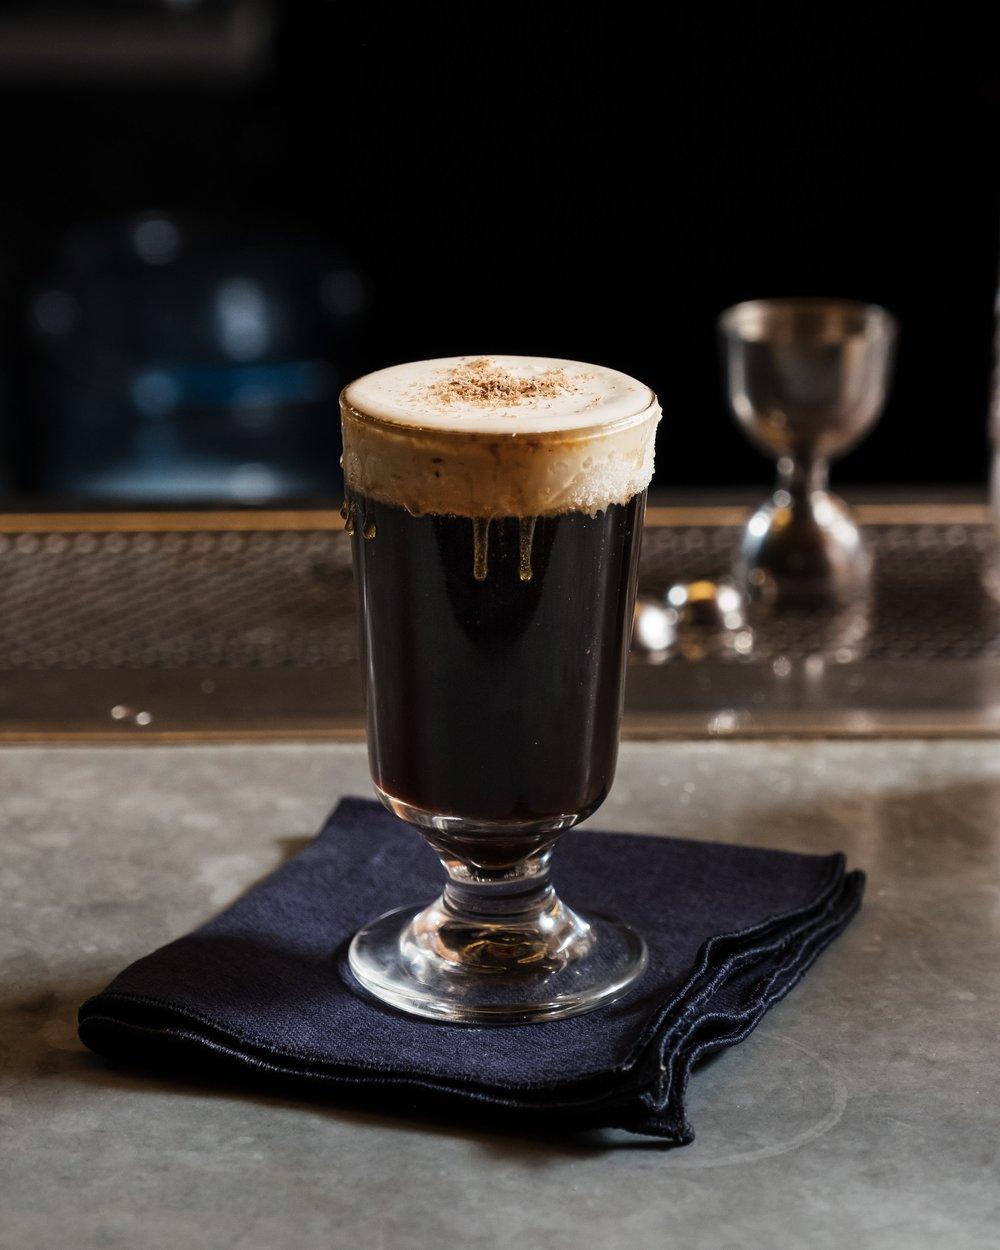 ingredients: - 3/4 oz 151-proof rum1/4 oz triple sec1 1/2 oz coffee liqueur3 oz freshly brewed coffeeSuper fine sugarNutmeg